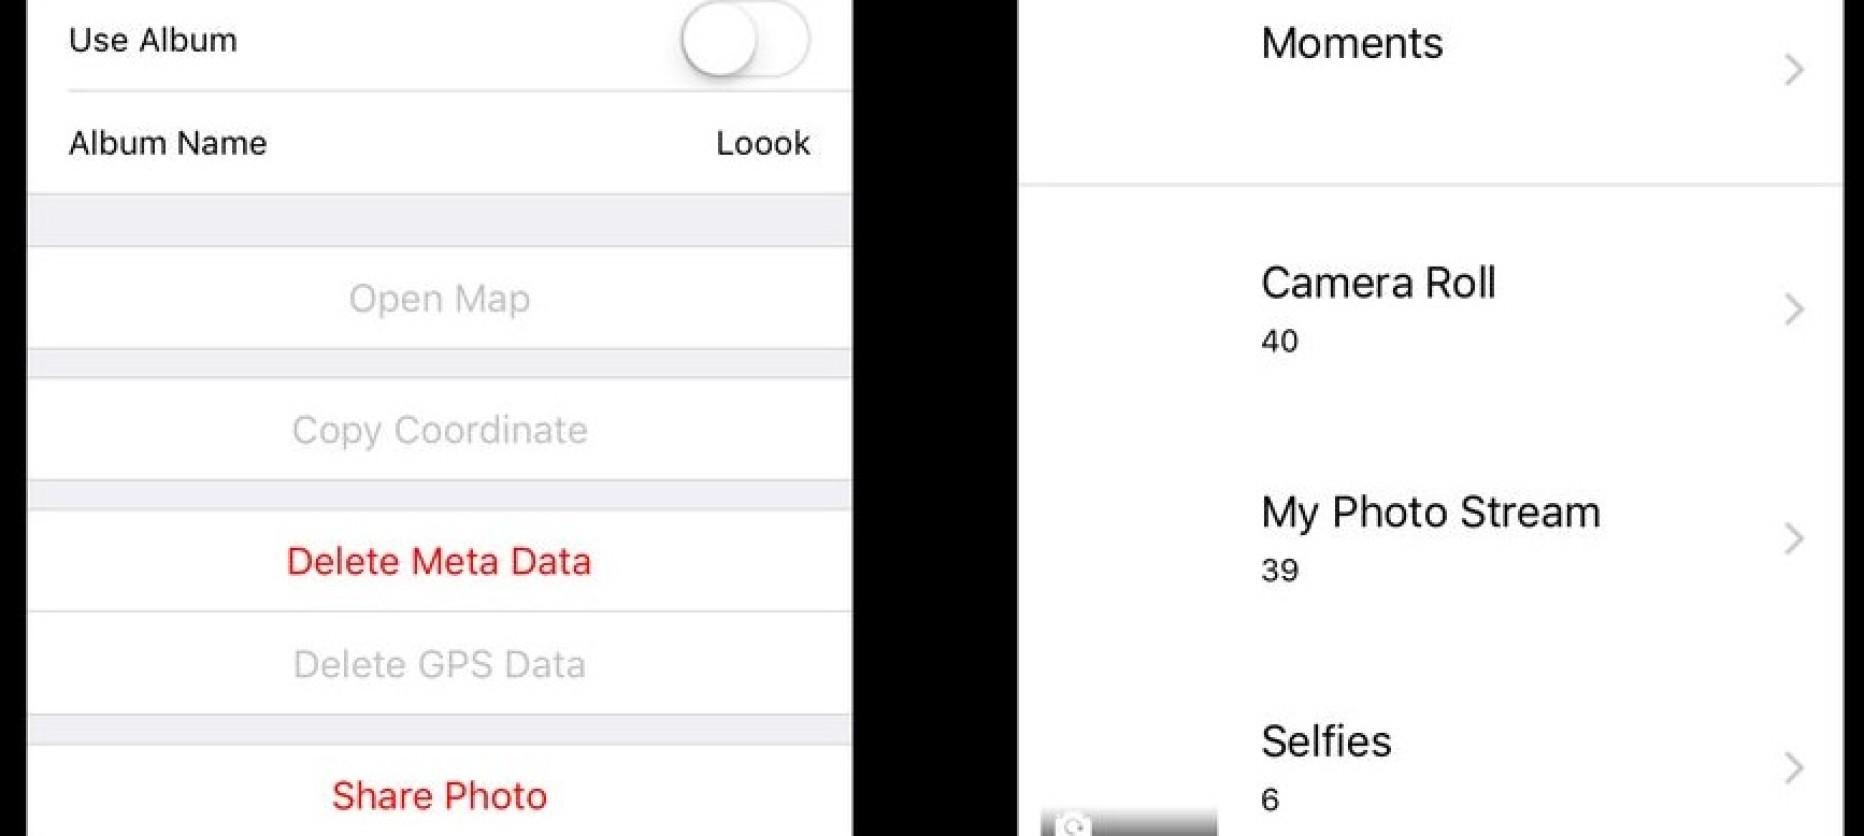 Wipe Meta Data on Photos with Loooks